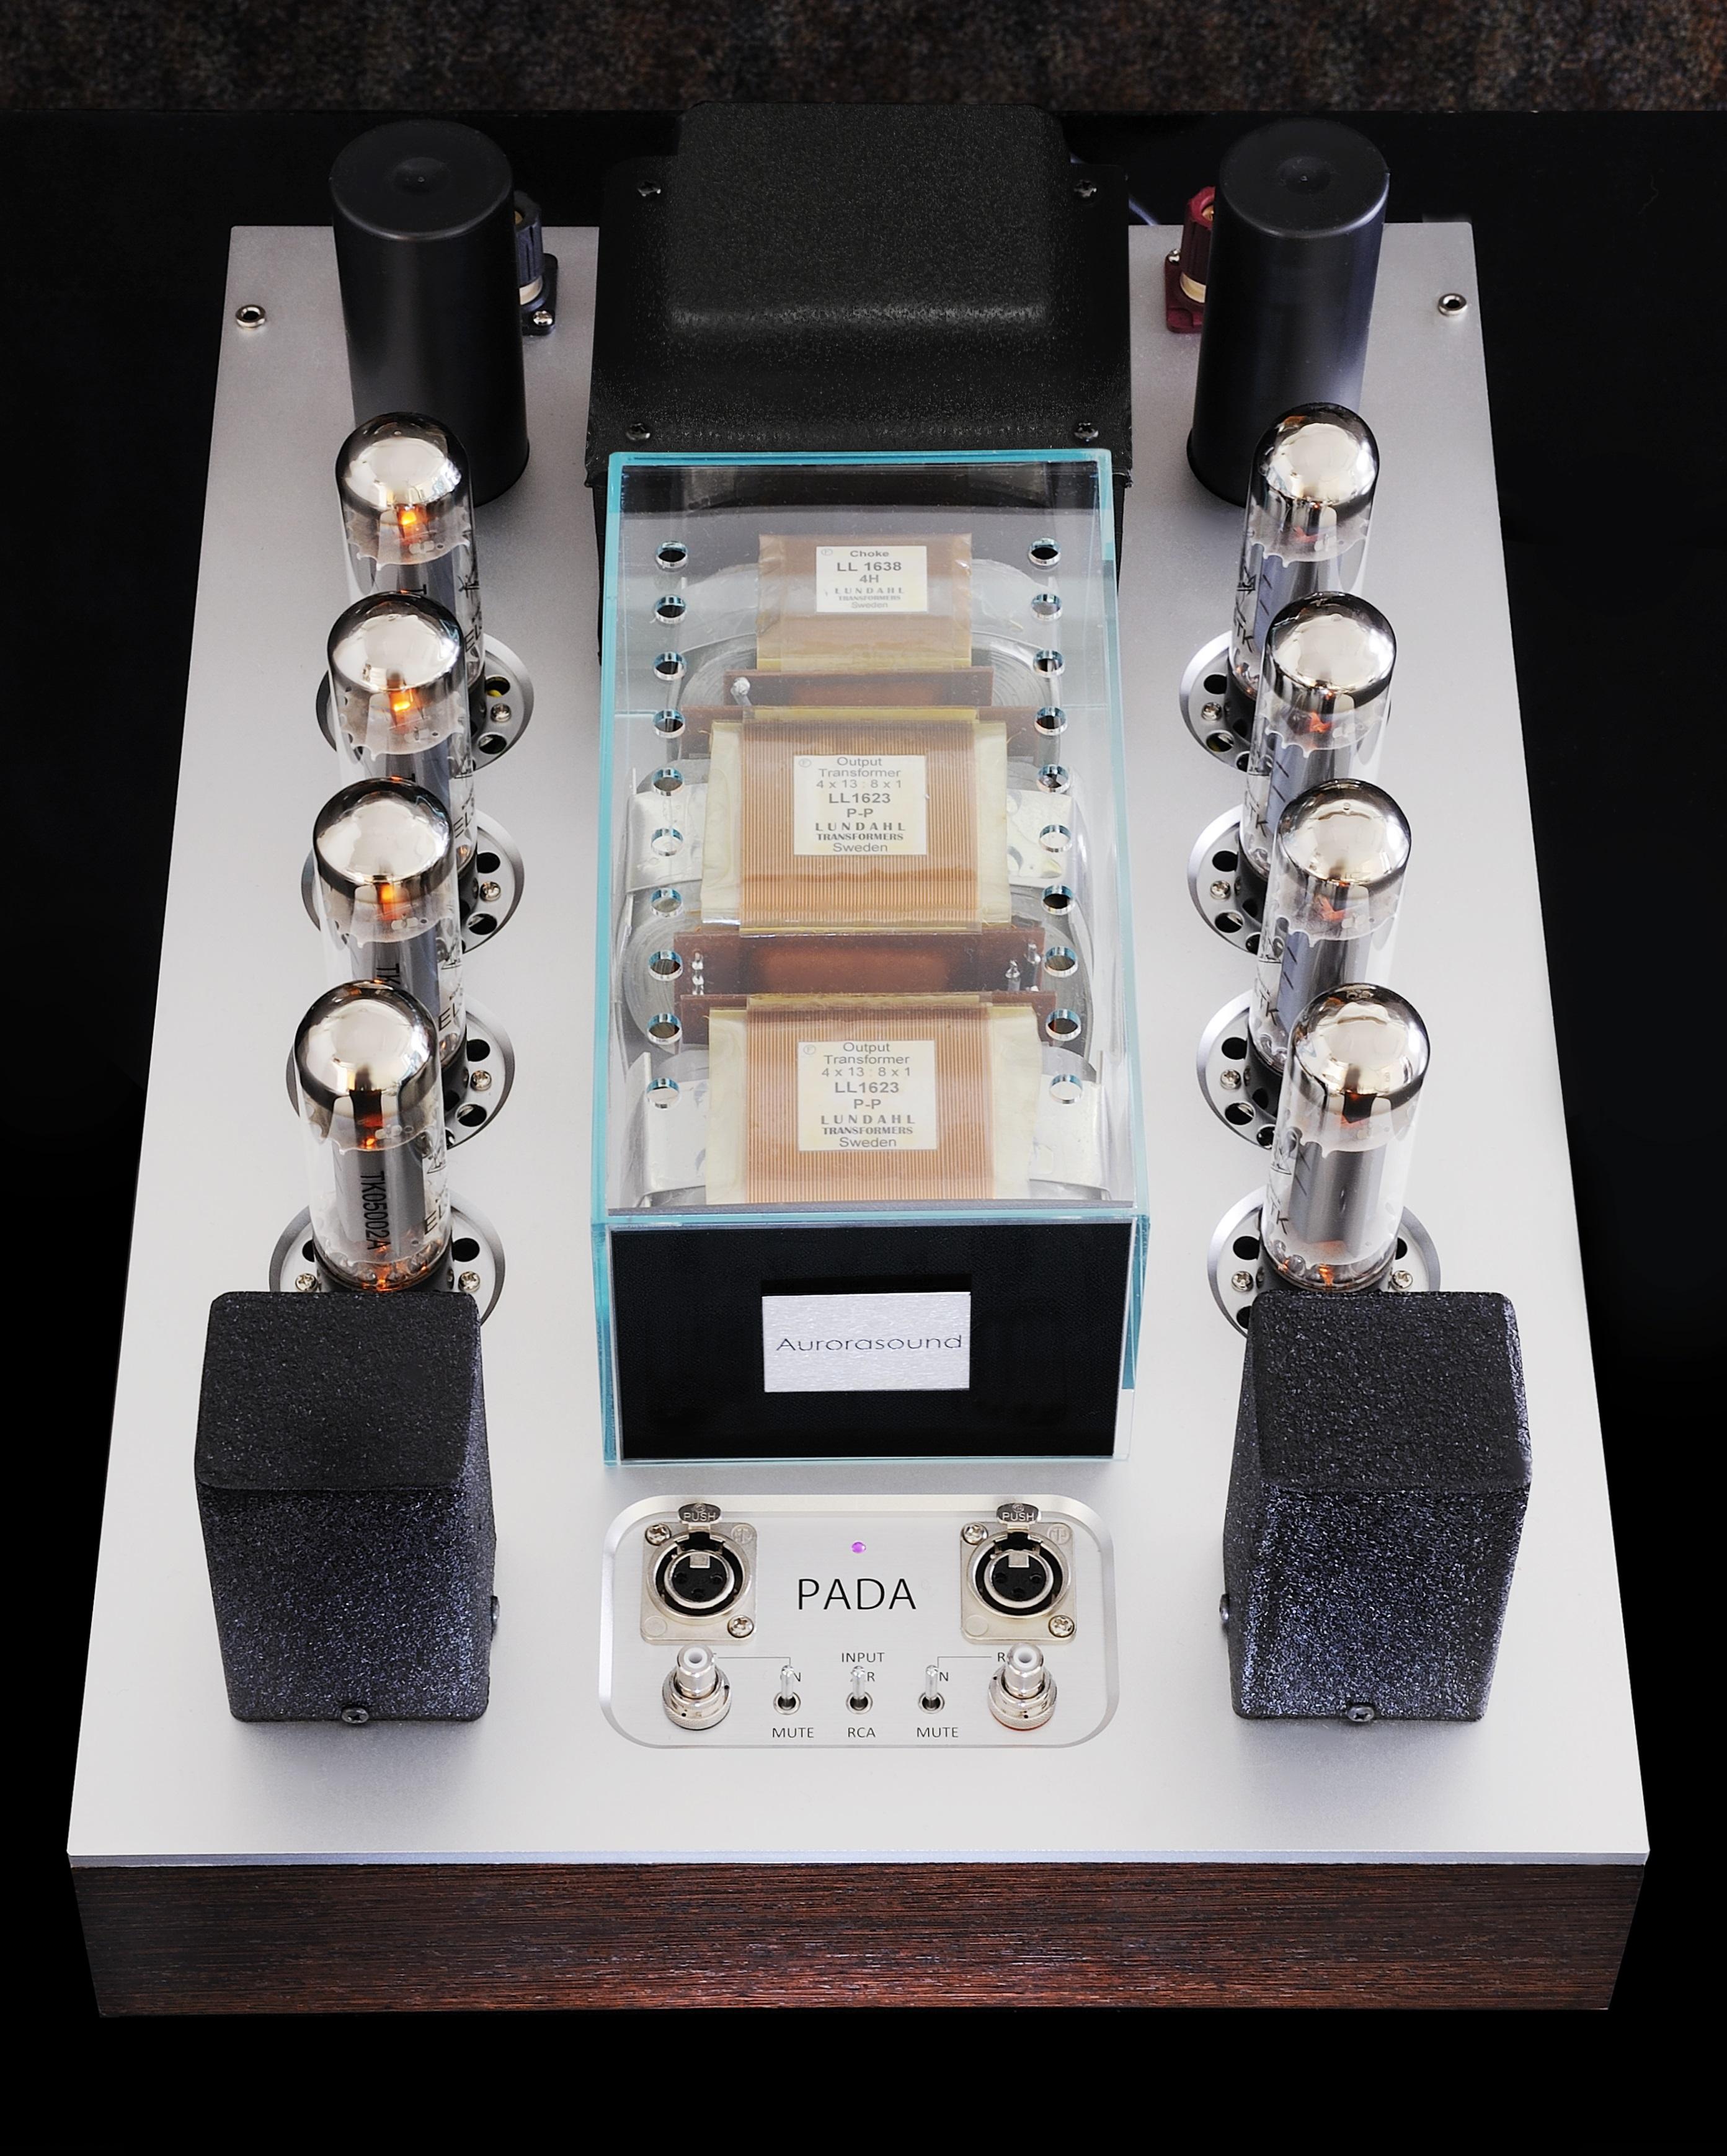 PADA-English - オーディオ・音響・PCオーディオ・アナログの